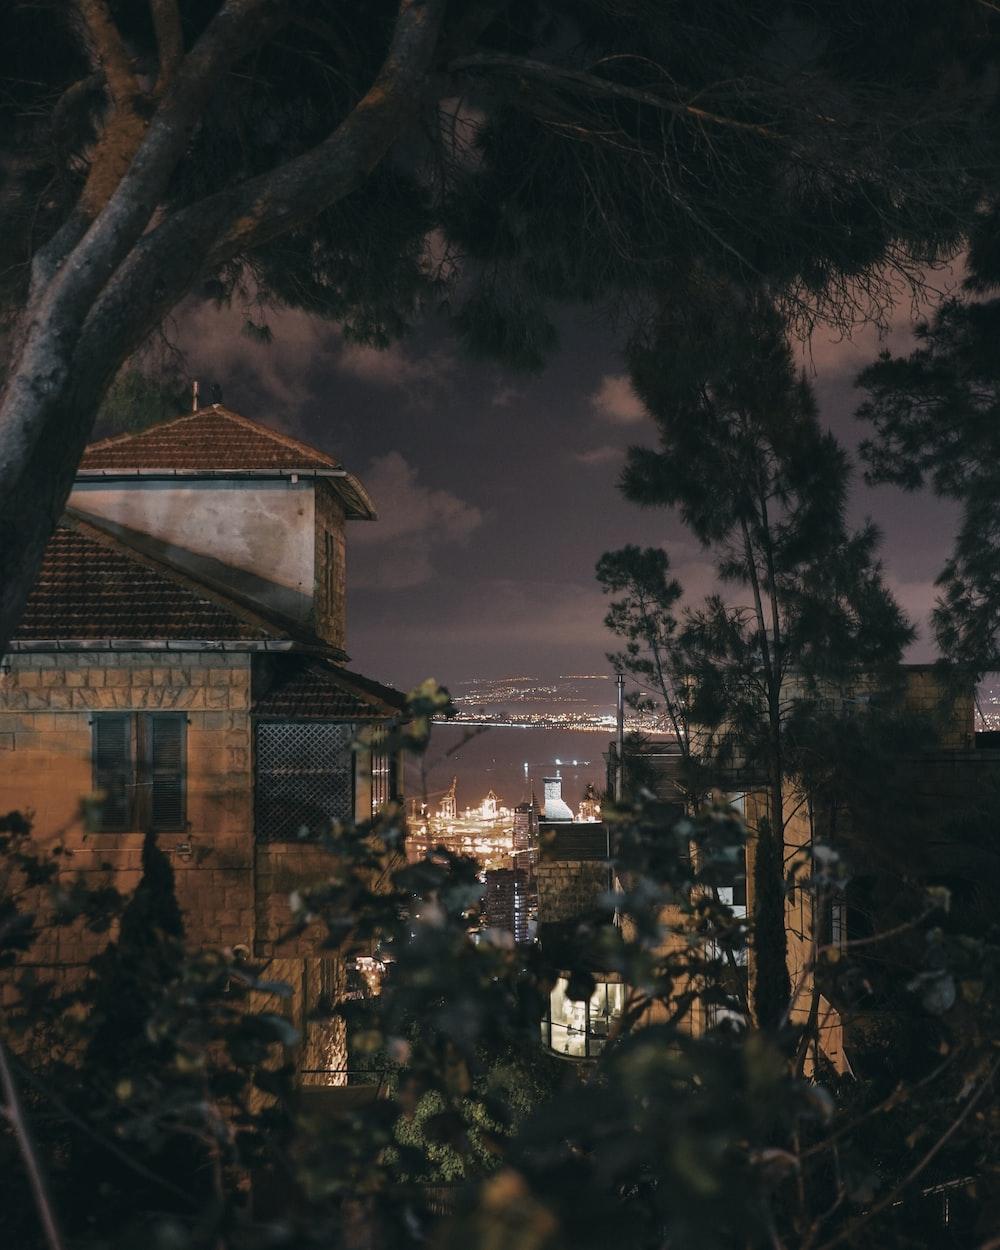 houses near trees at night